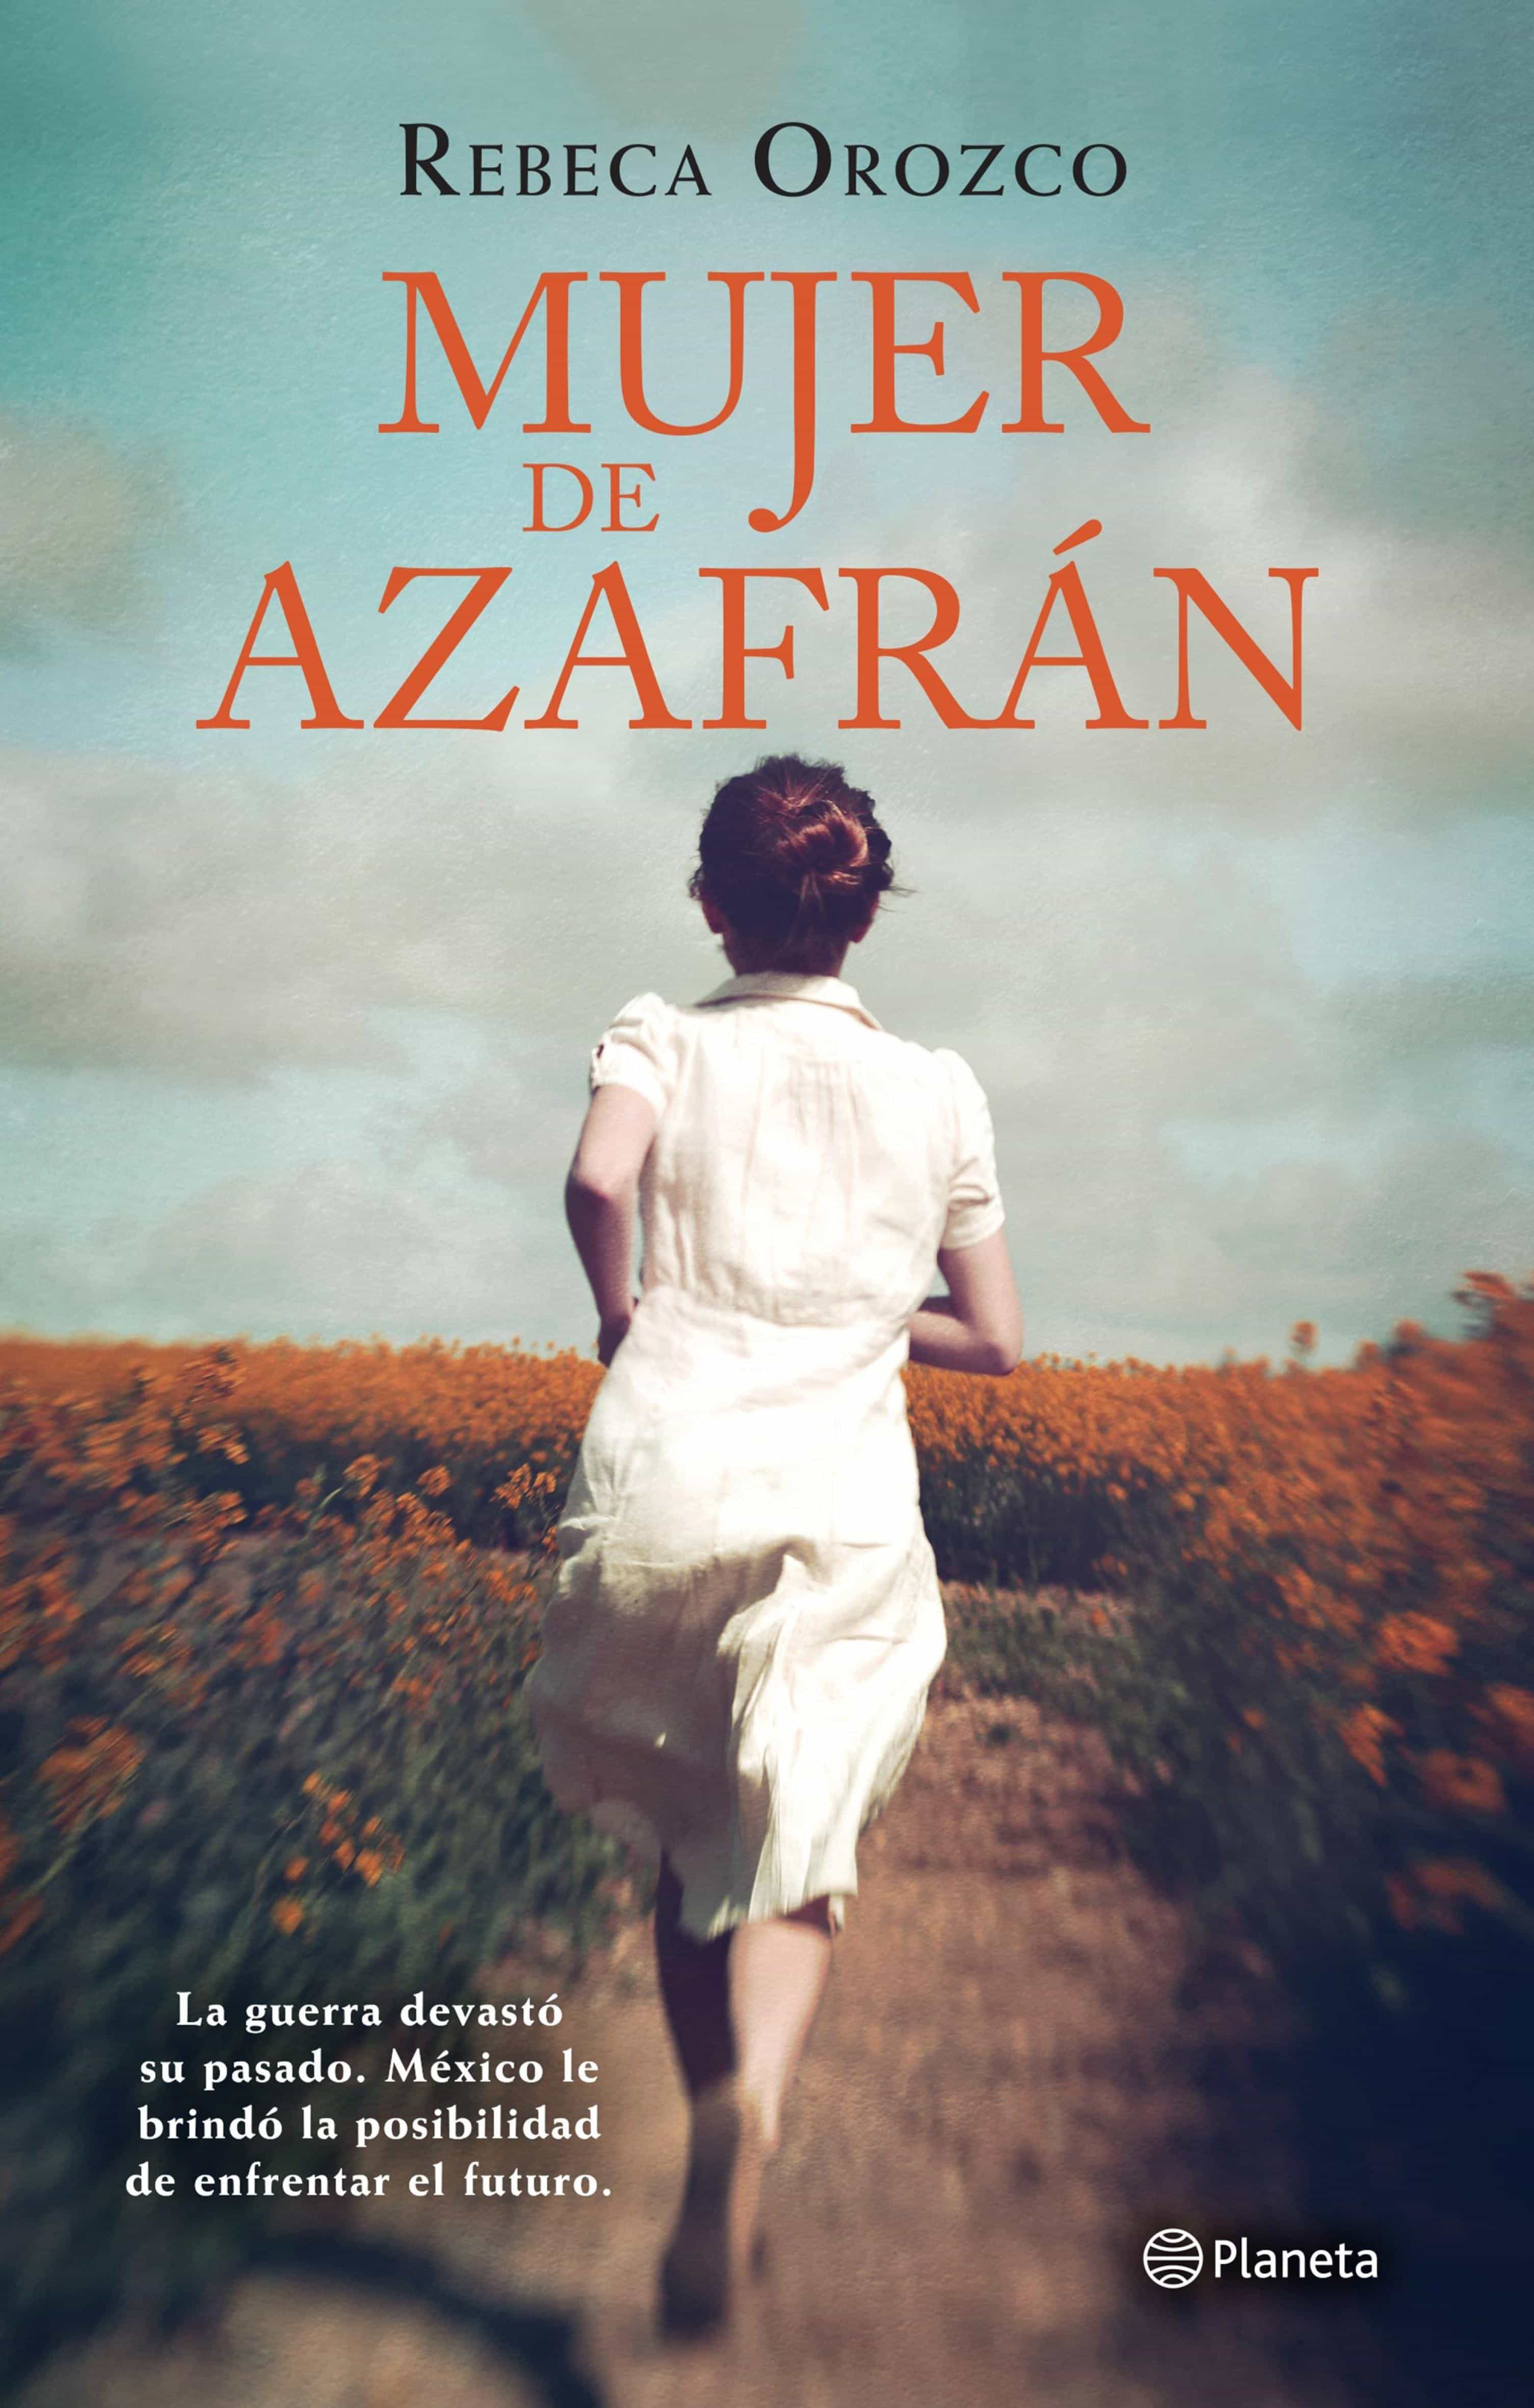 Mujer de azafrán